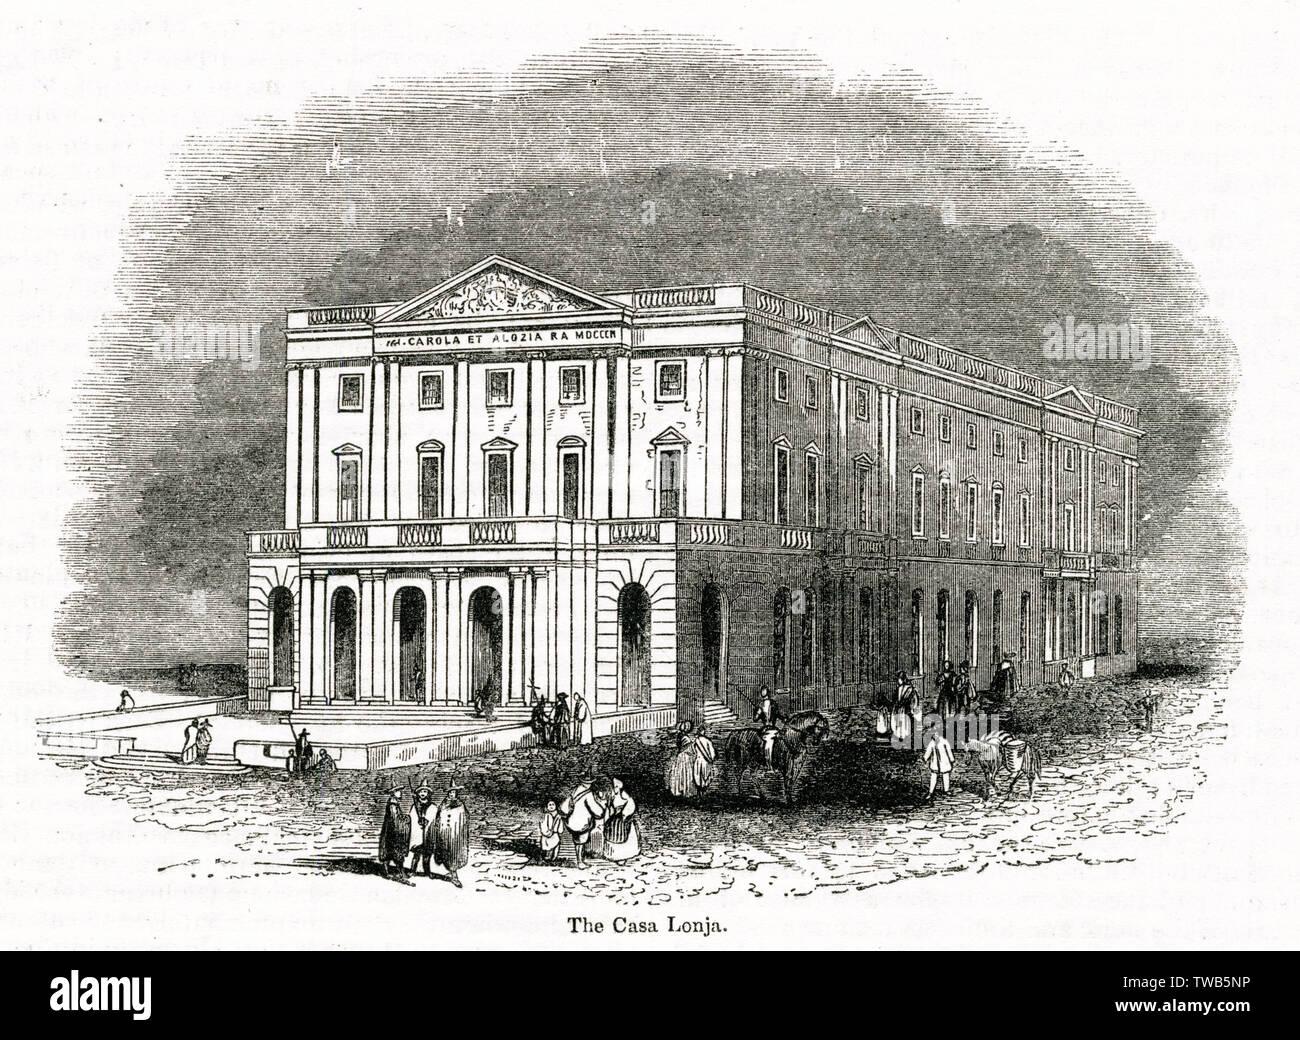 Casa Lonja (Llotja) de Mar, Stock Exchange, Barcelona, Spain.      Date: 1843 - Stock Image